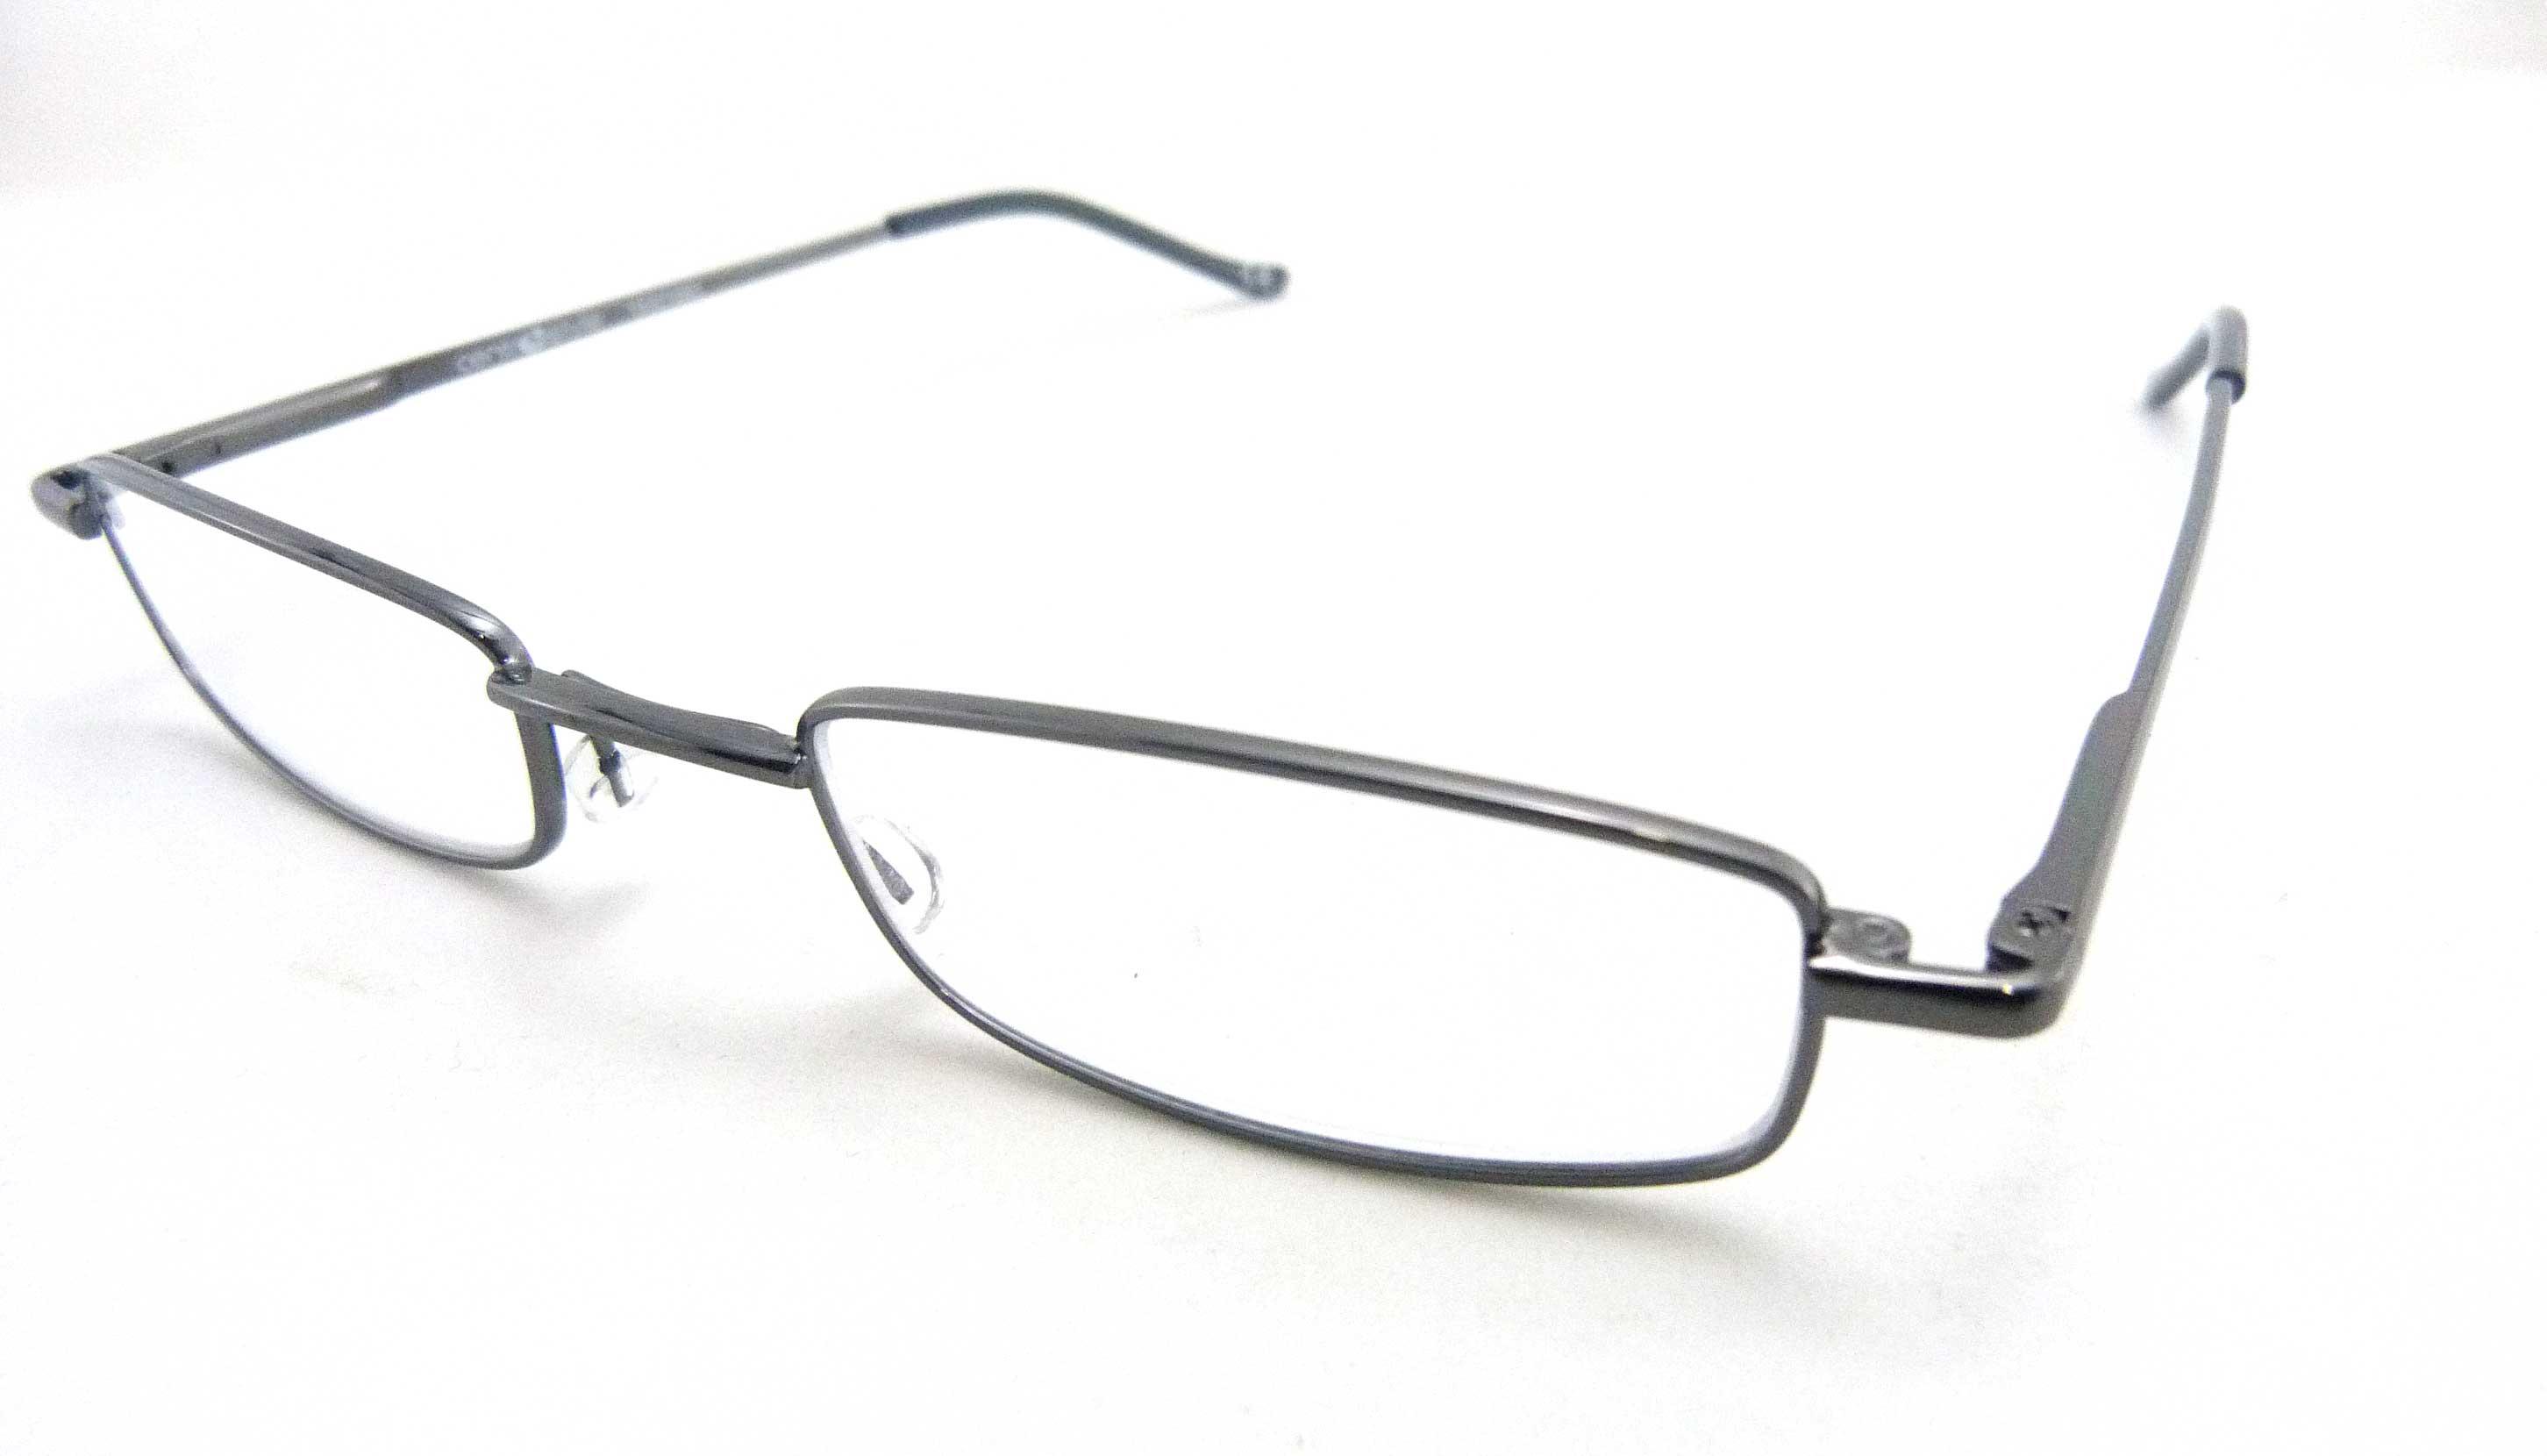 Óculos Leitura Flex AT +2,50 GunMetal Mod 63506 FLAG E